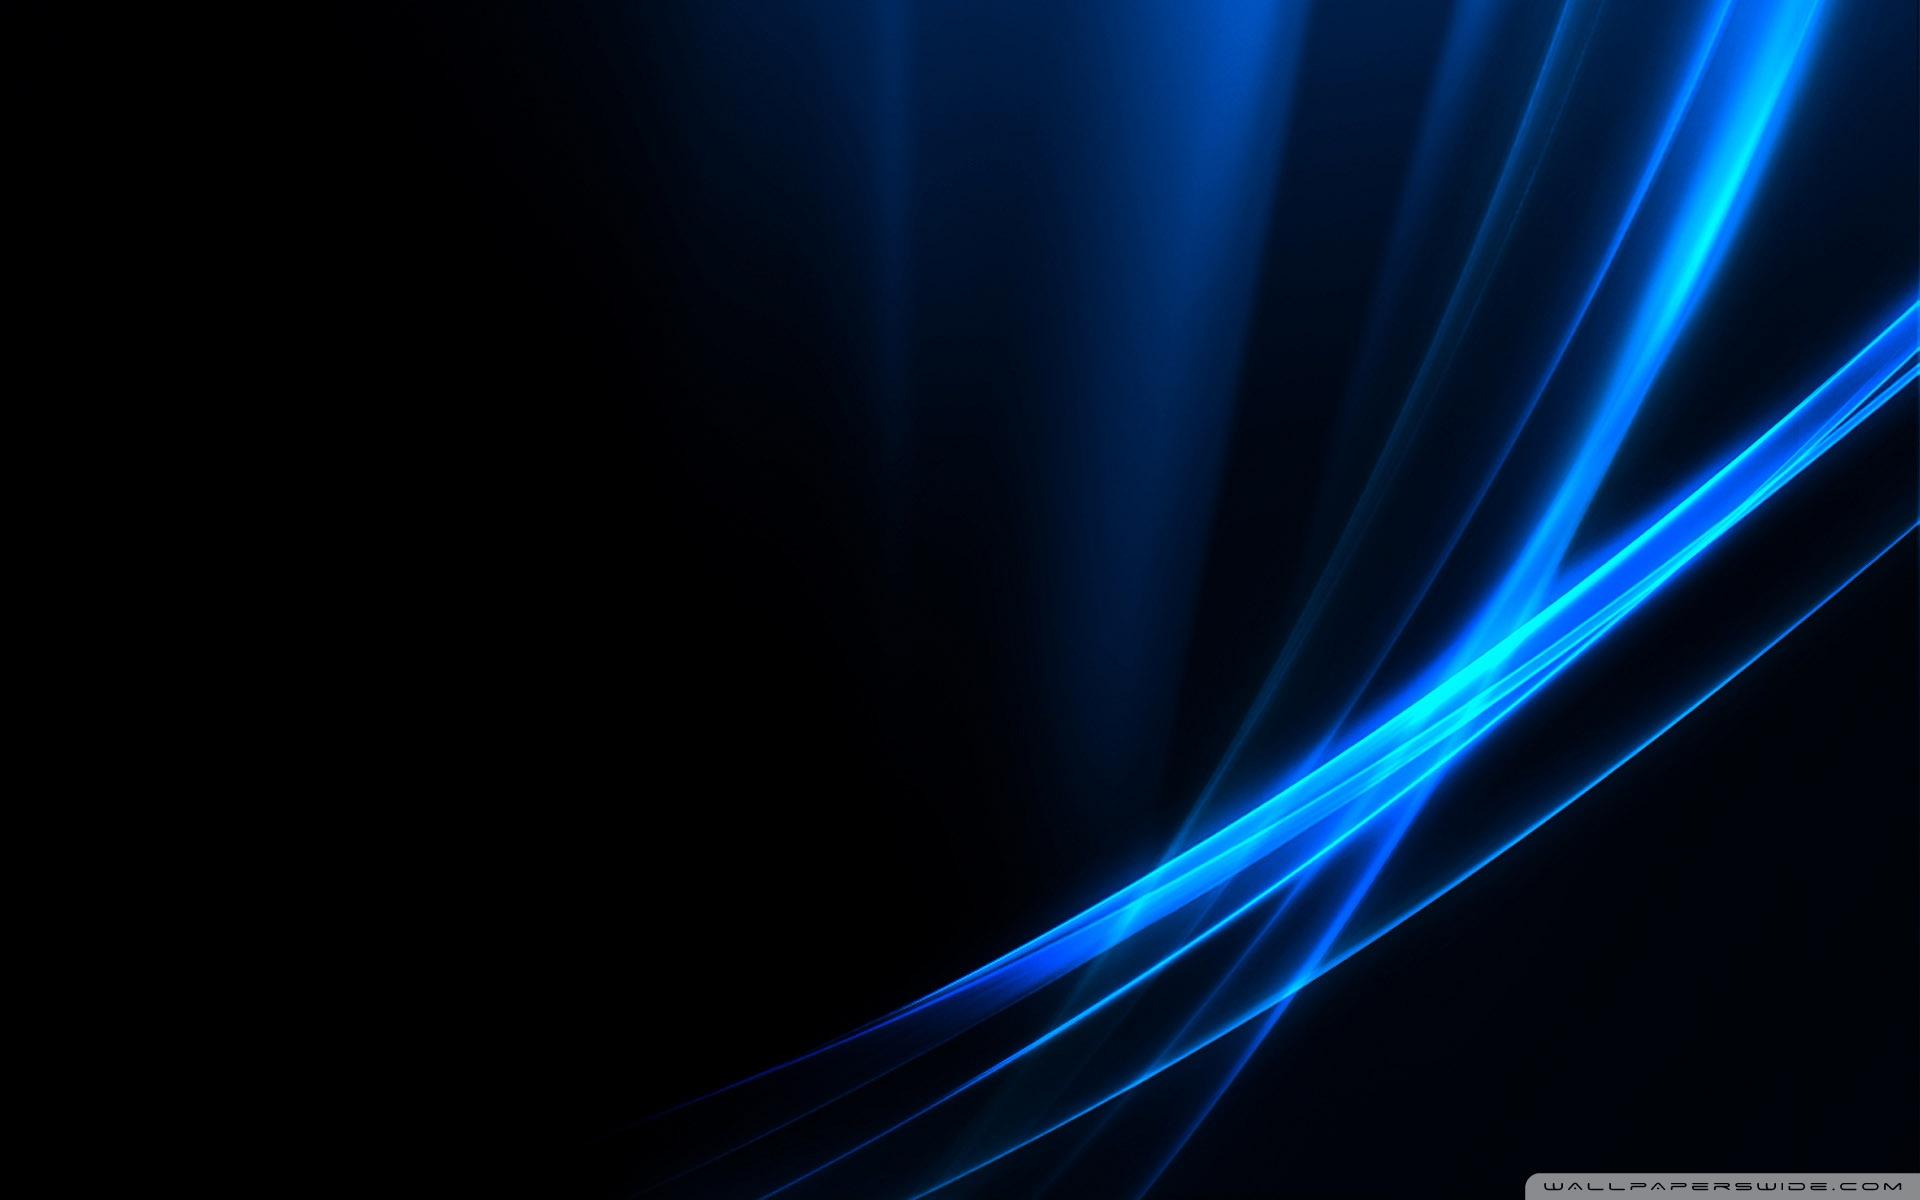 WallpapersWidecom Windows Vista HD Desktop Wallpapers for 4K 1920x1200